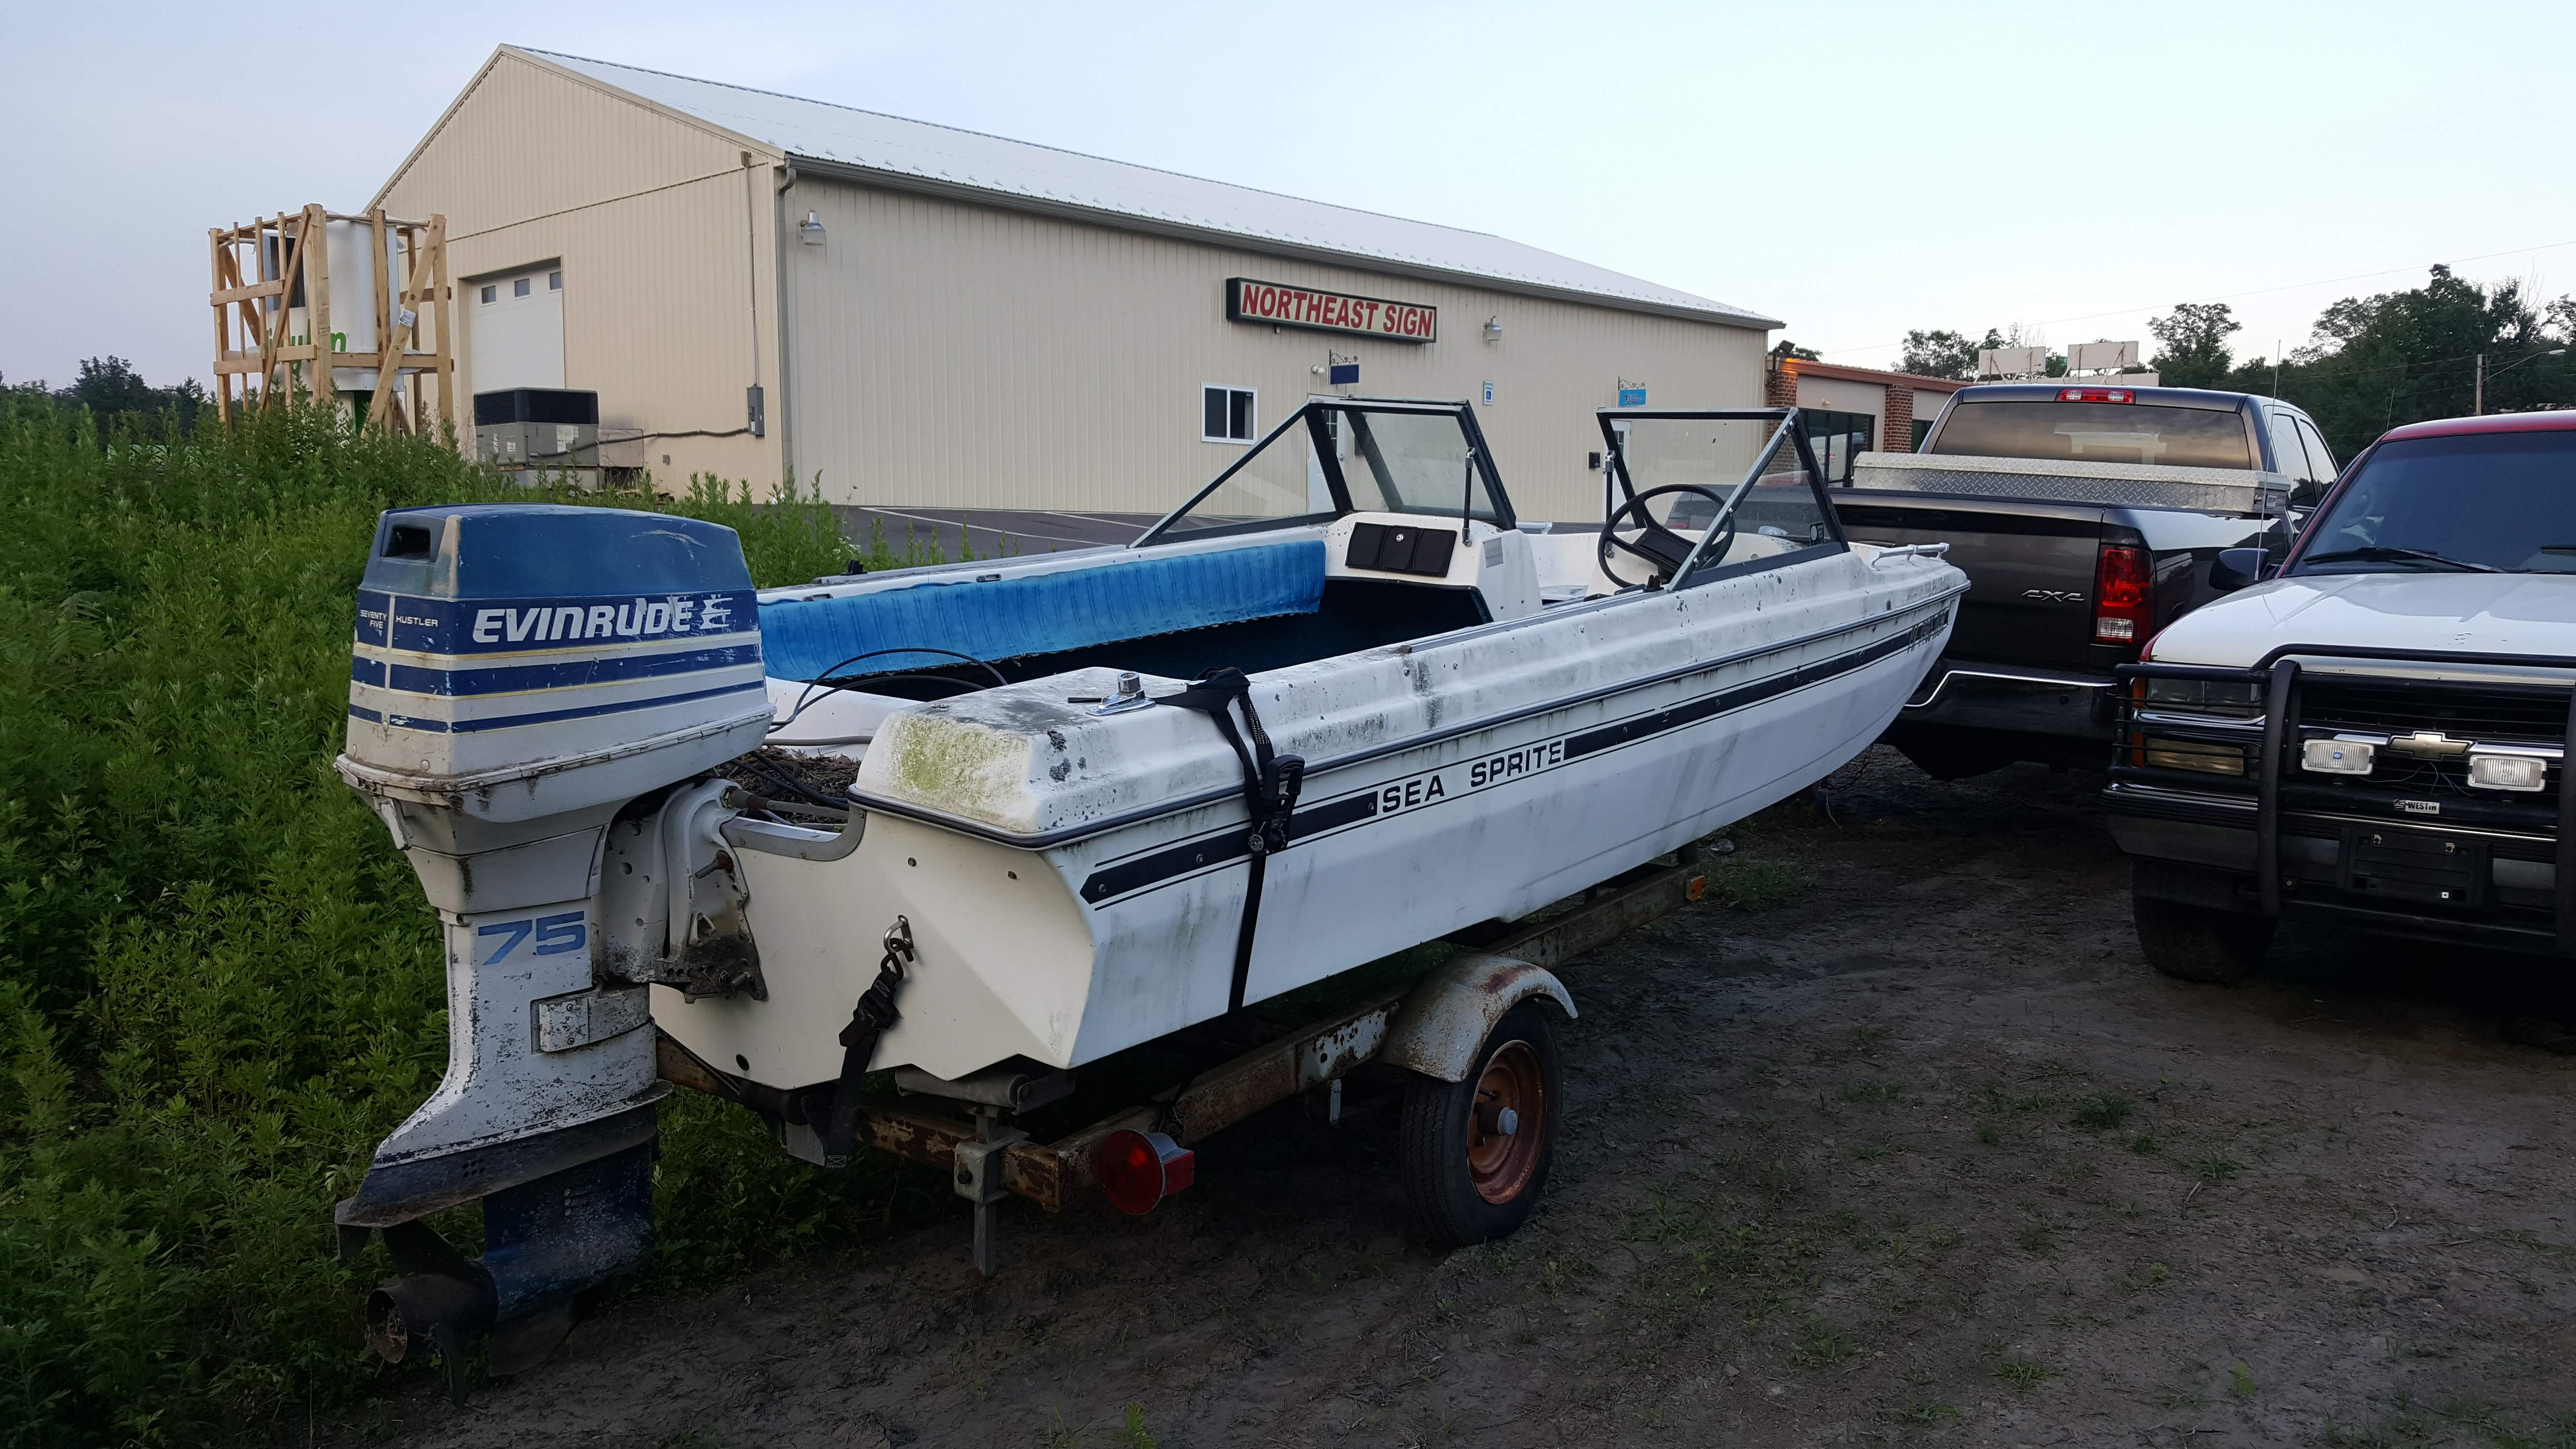 Boat Removal Scranton/Wilkes-Barre